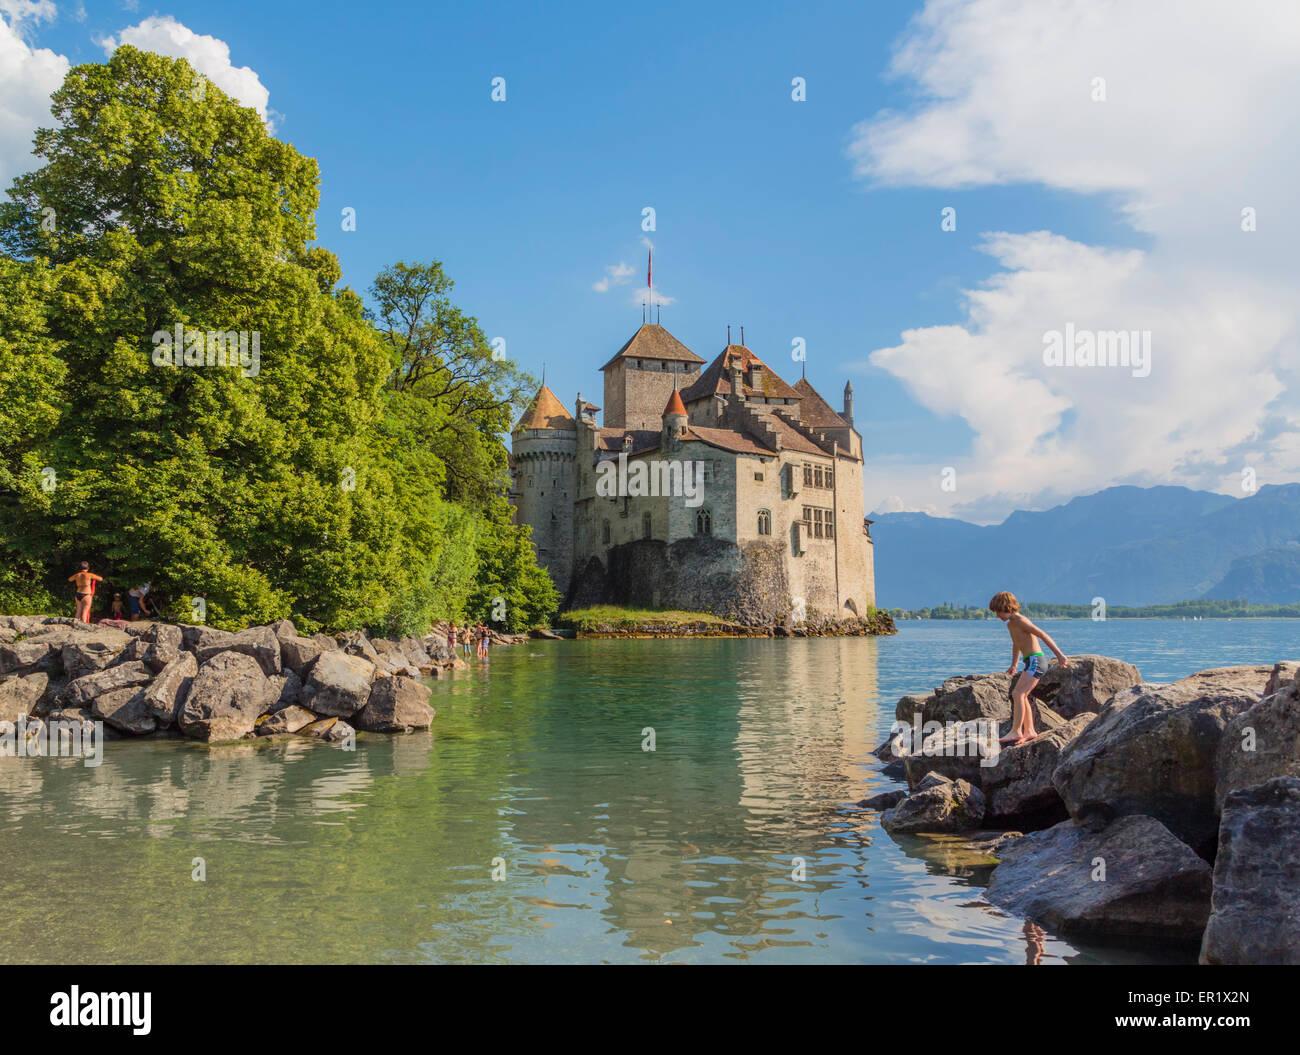 Veytaux, Vaud Canton, Switzerland.  Chateau de Chillon on shore of Lake Geneva (Lac Leman). - Stock Image